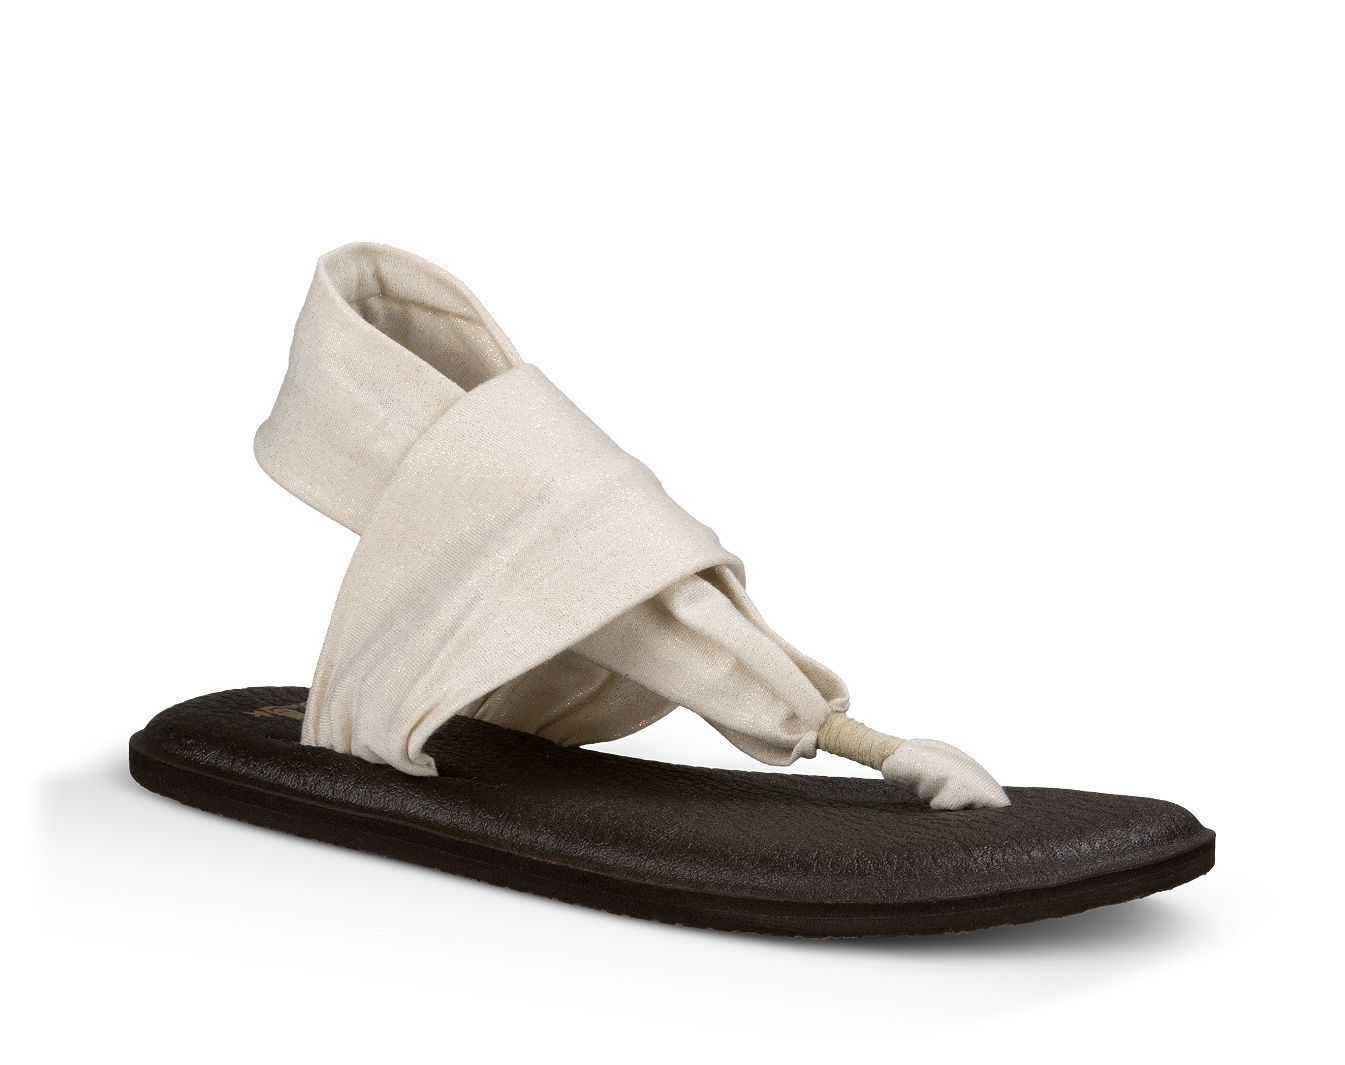 Sanuk Yoga Sling 2 Metallic Women's Slingback Sandal - pink gold - SWS10951